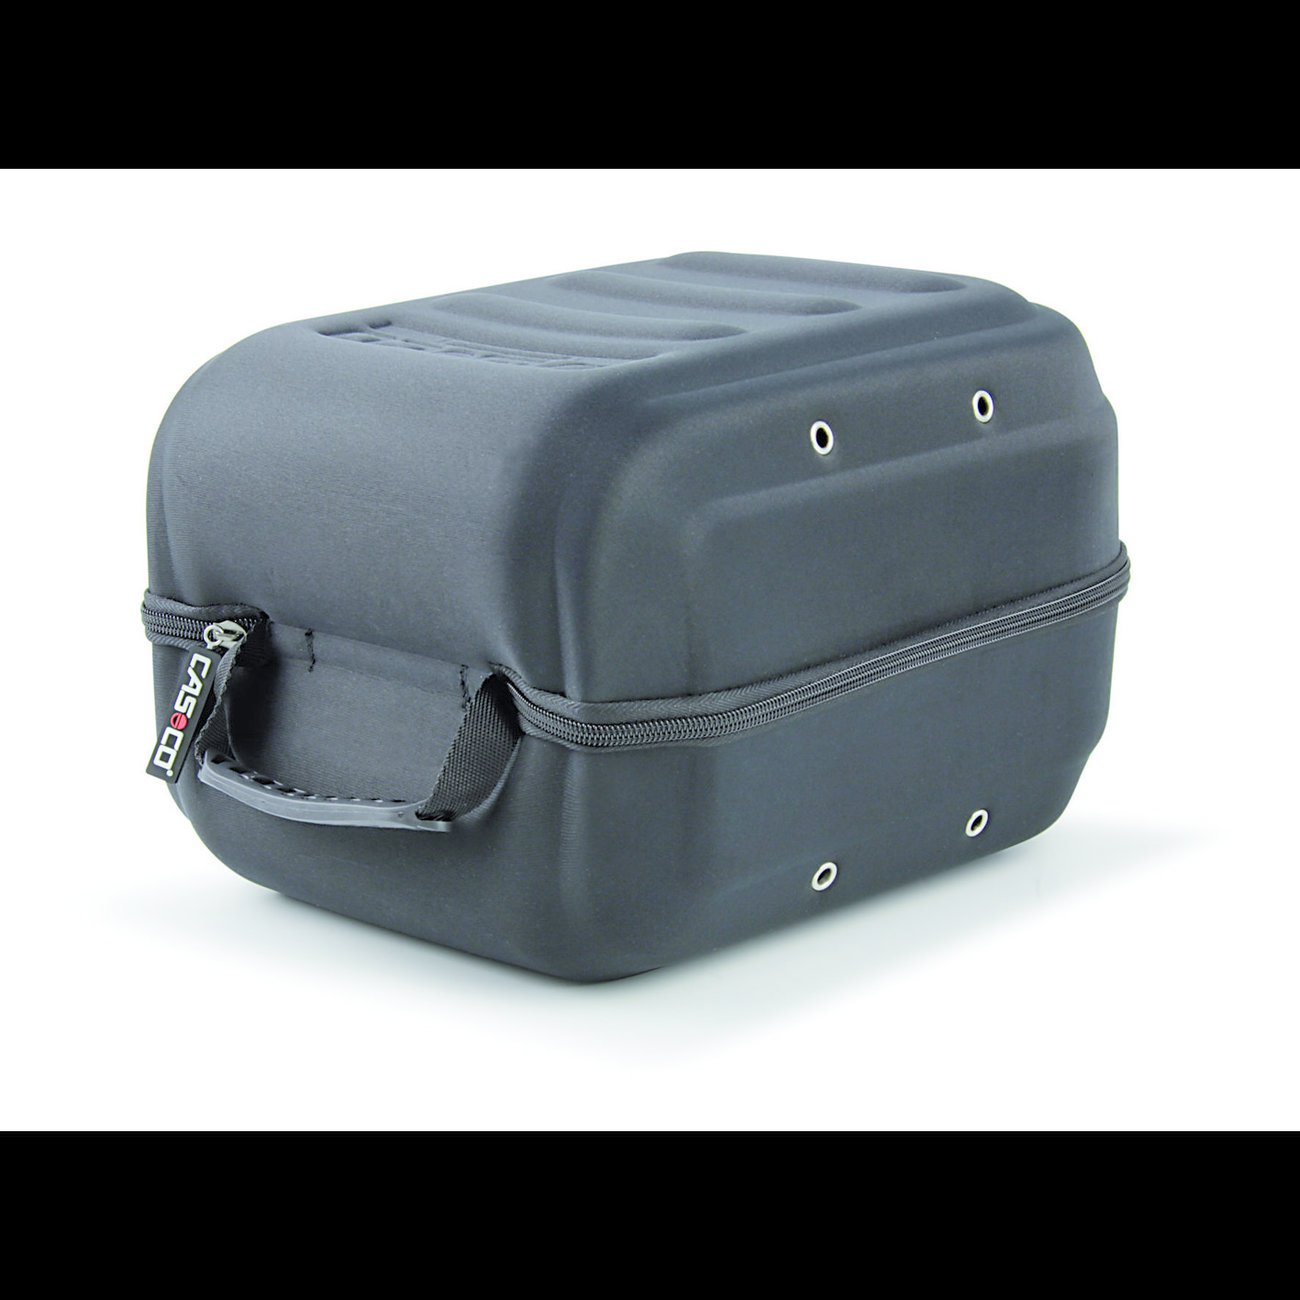 CASCO Hardcase Helm Helmbox Preview Image